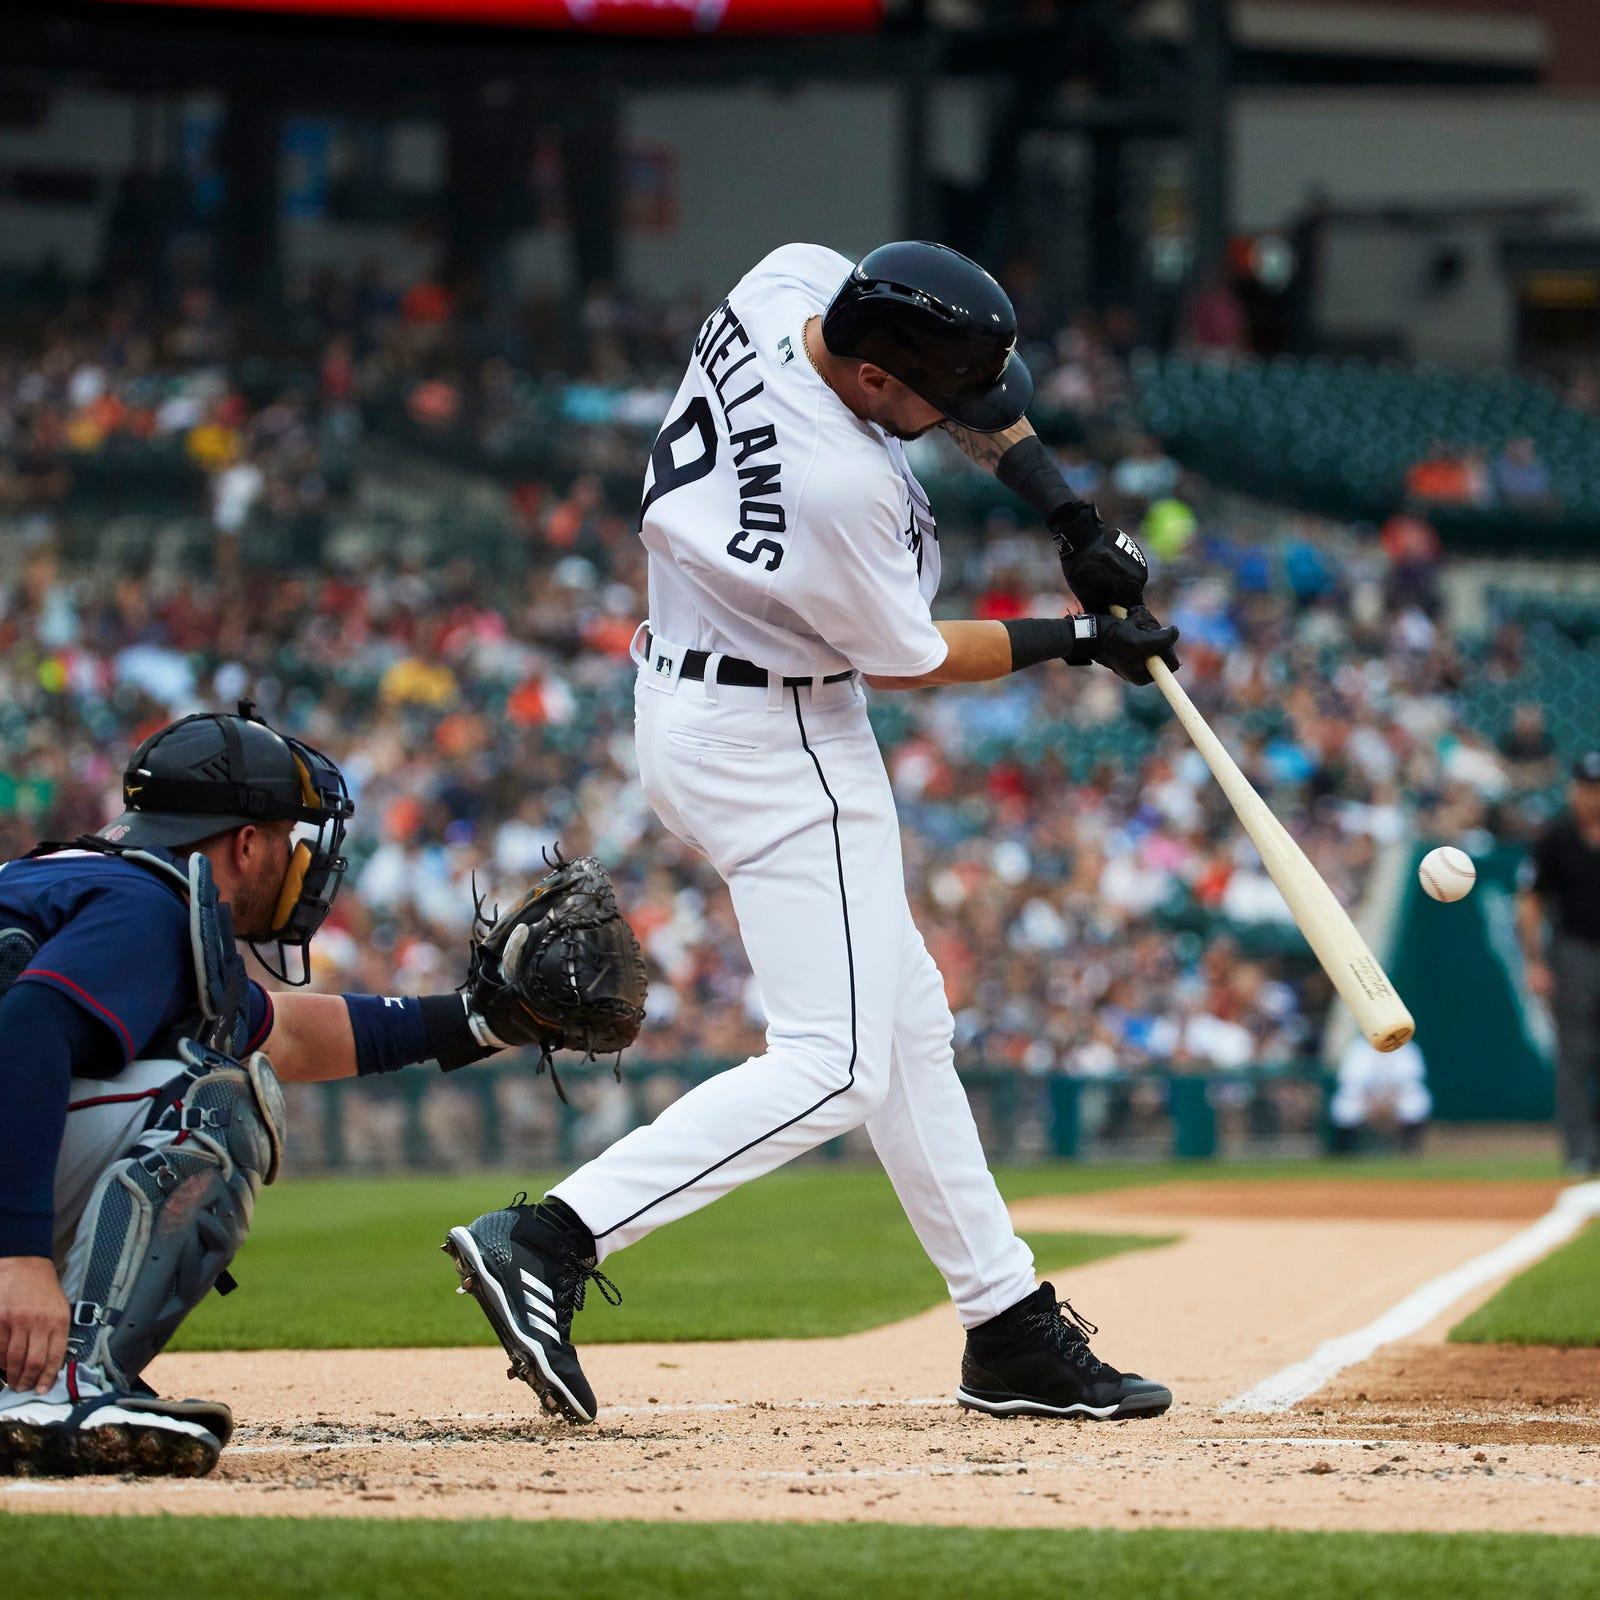 Where does Detroit Tigers' Nicholas Castellanos fit in: RF, DH, 1B?